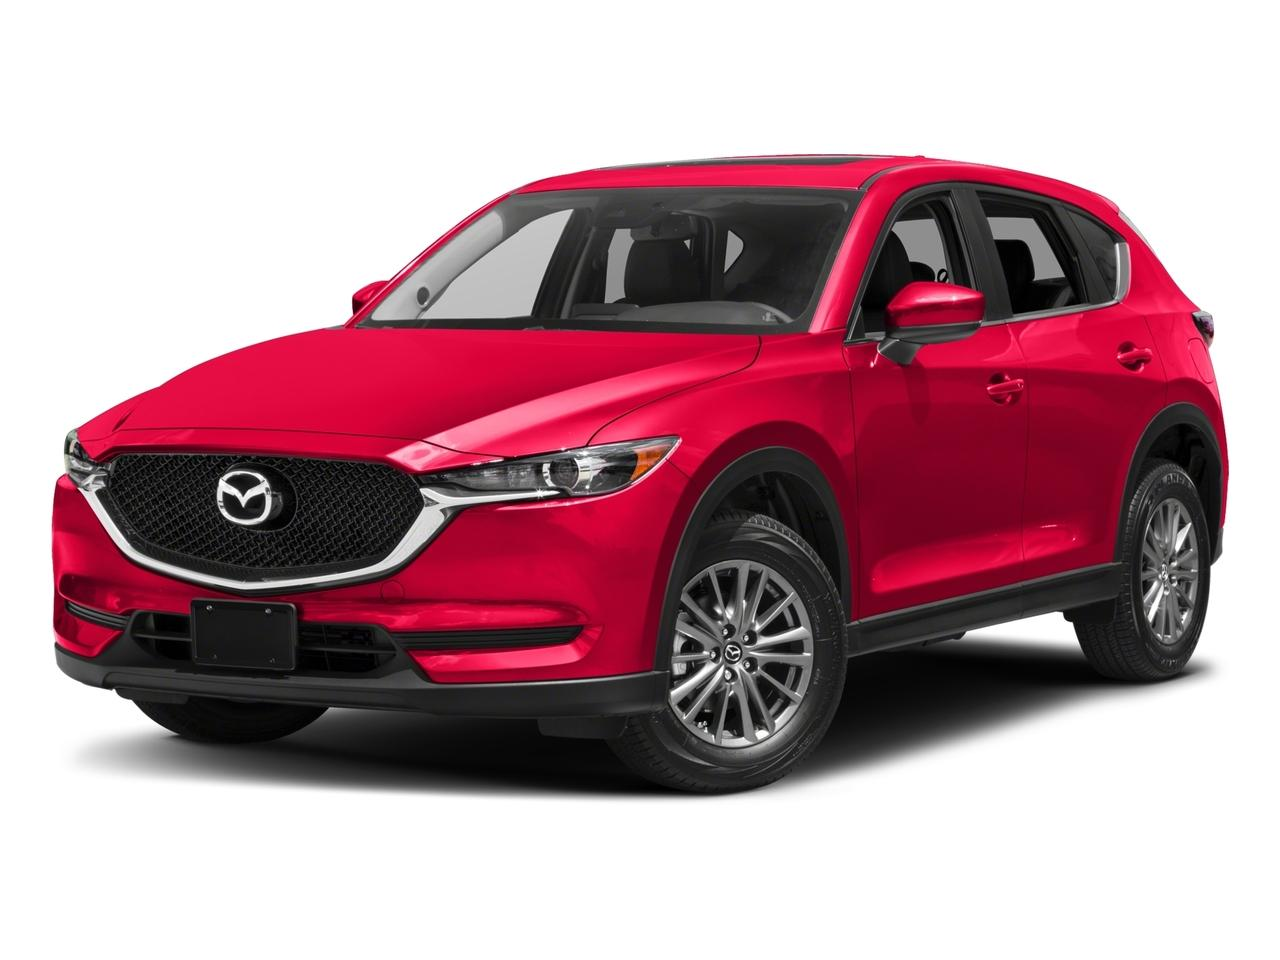 2017 Mazda CX-5 Vehicle Photo in Odessa, TX 79762